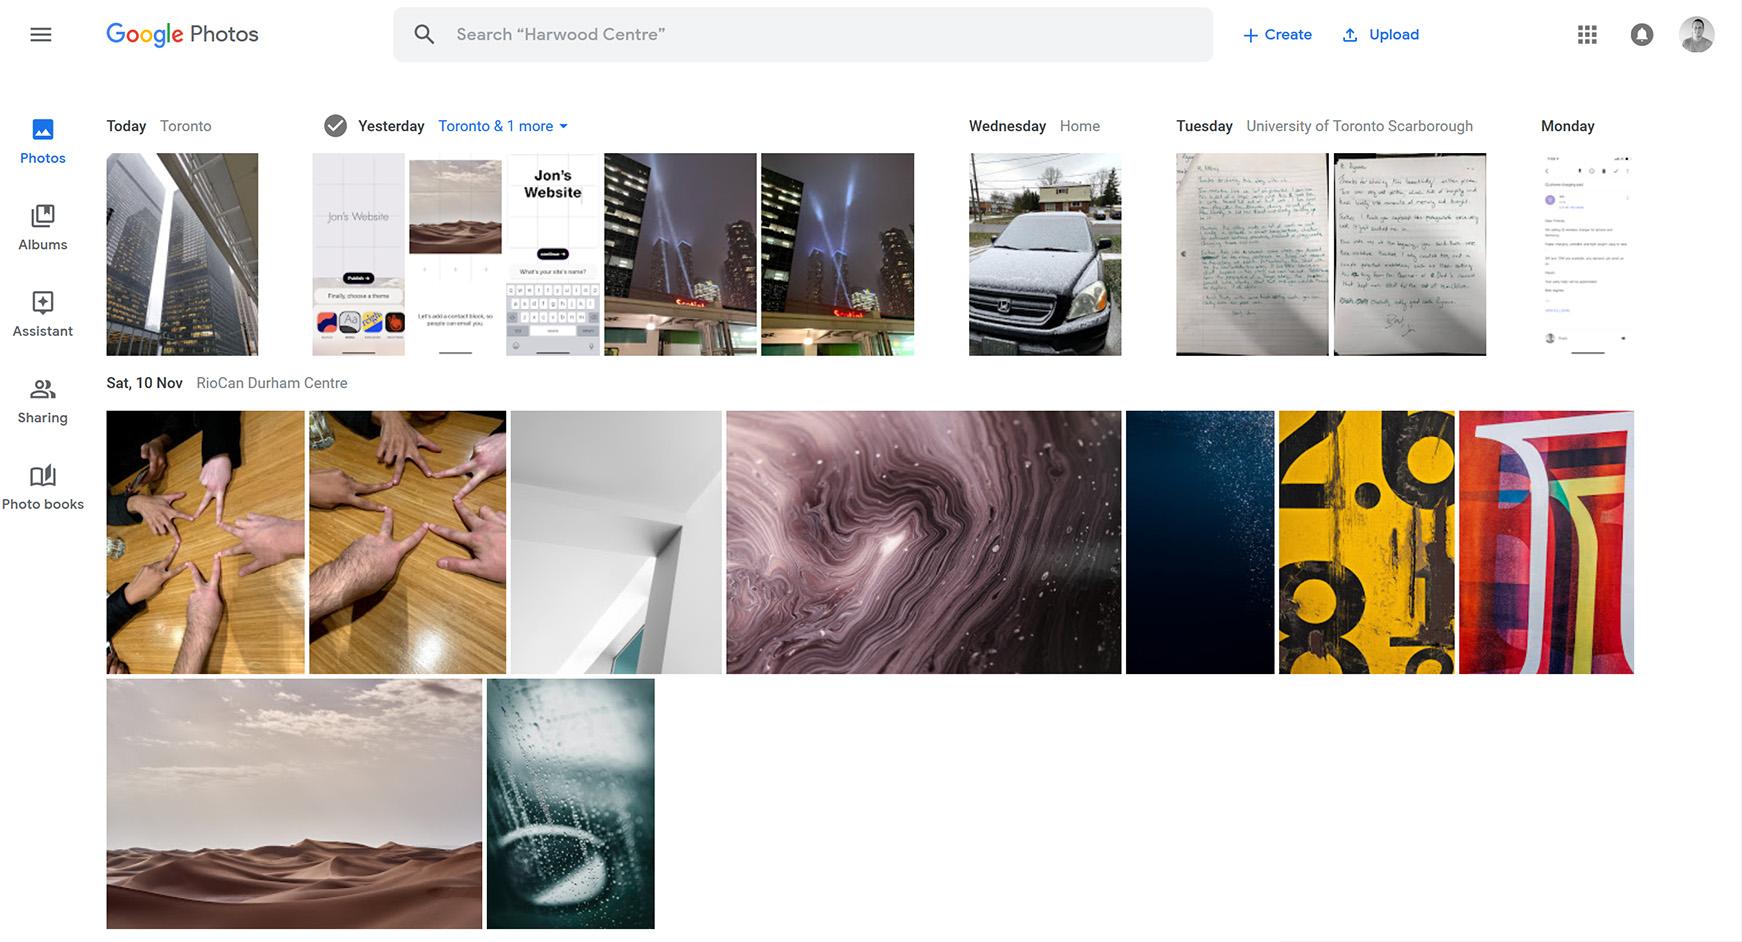 Google Photos website redesign